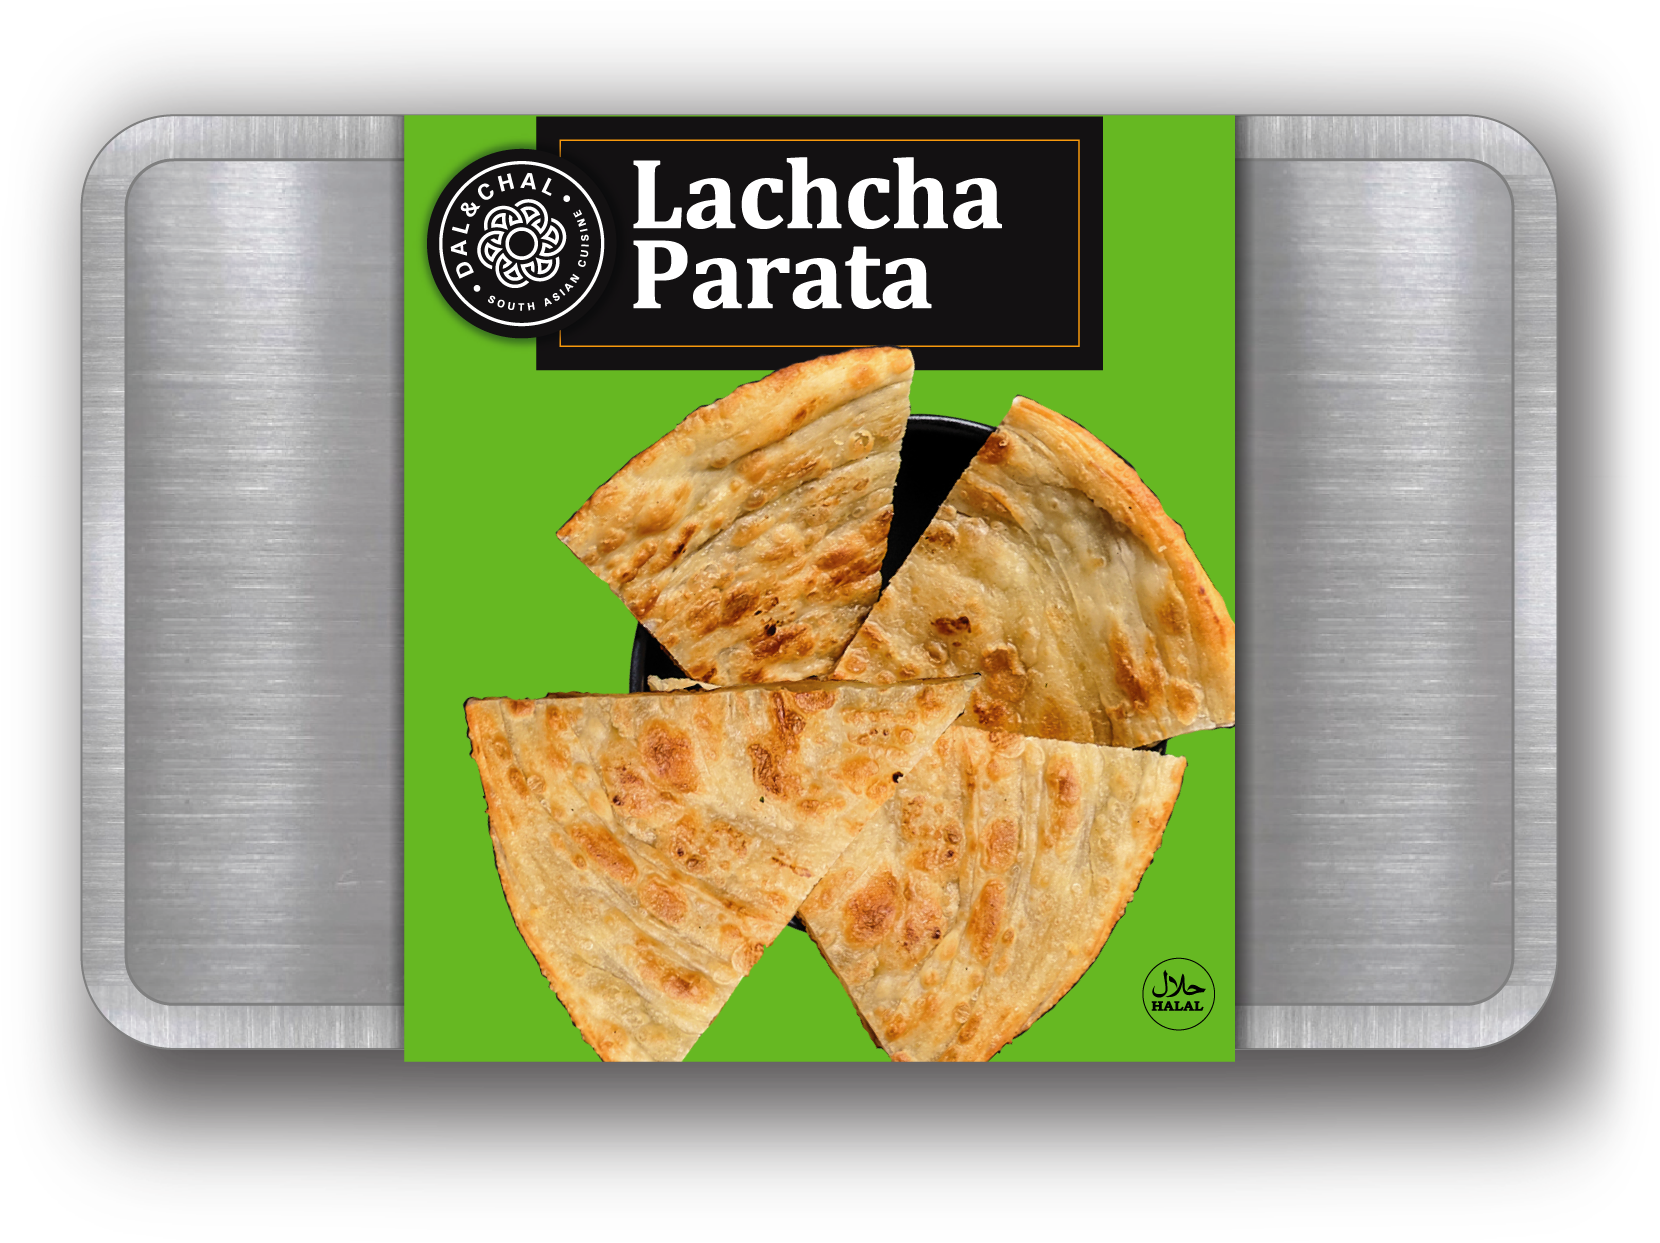 LACHCHA PARATA